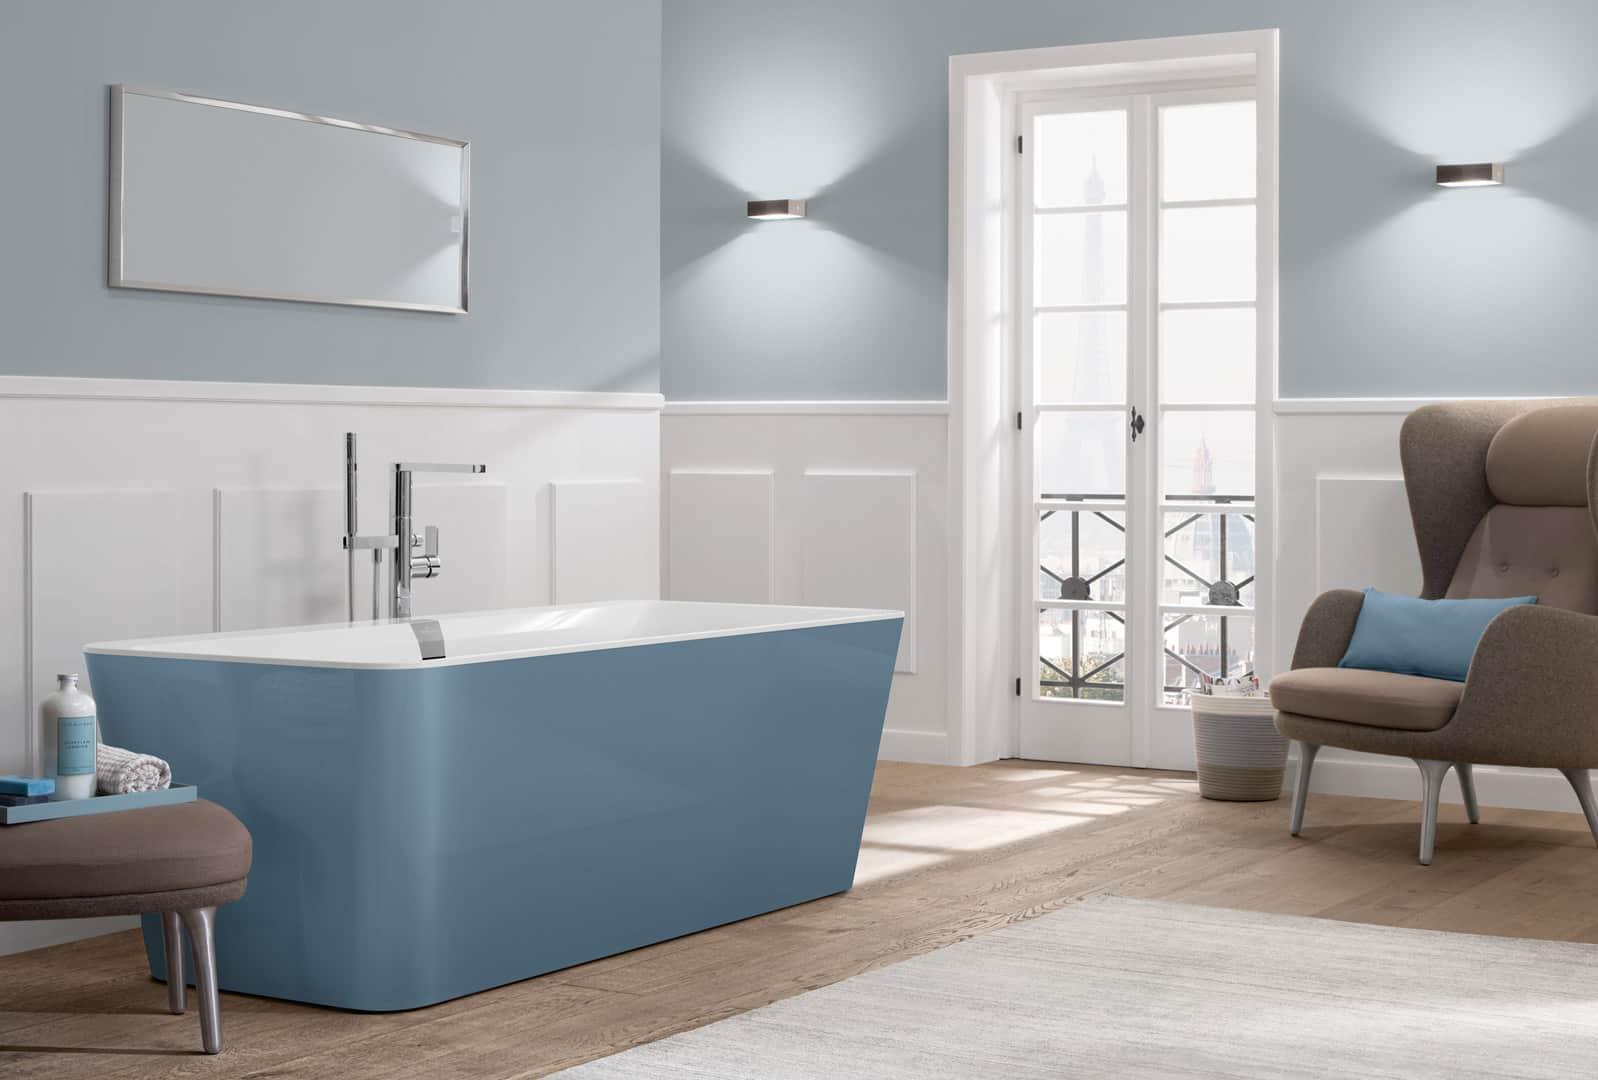 Freistehende Badewanne blaugrau